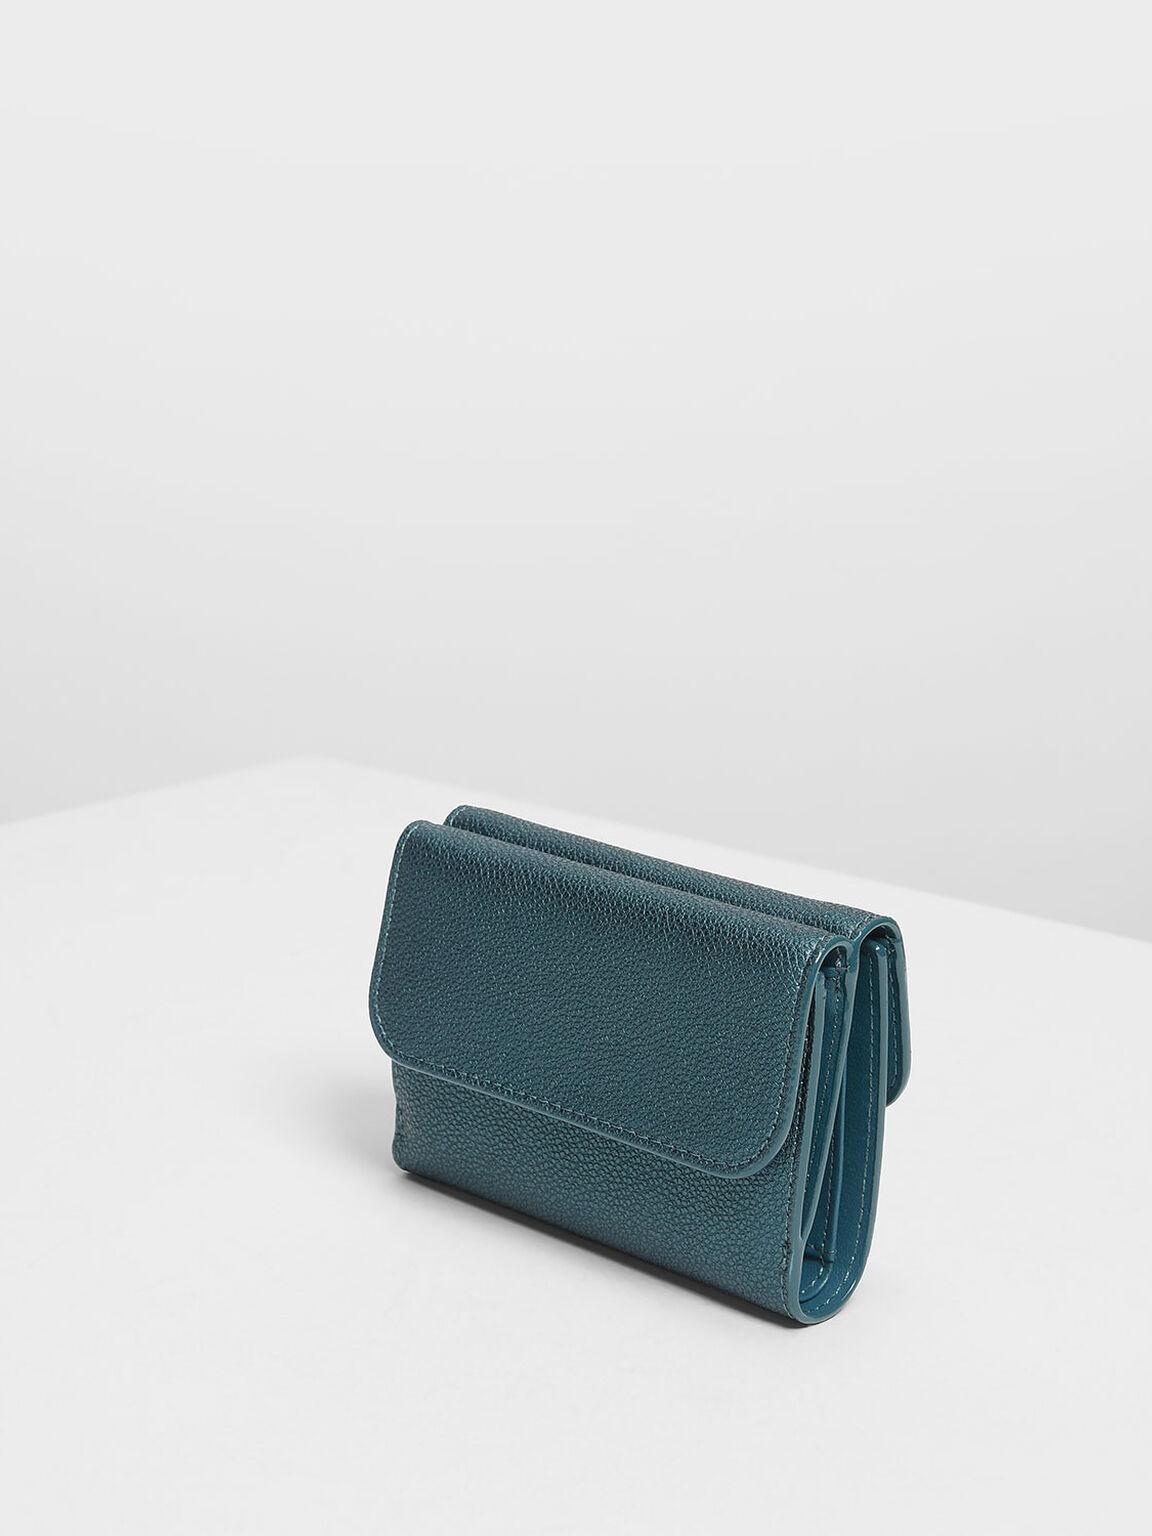 Classic Snap Button Wallet, Teal, hi-res